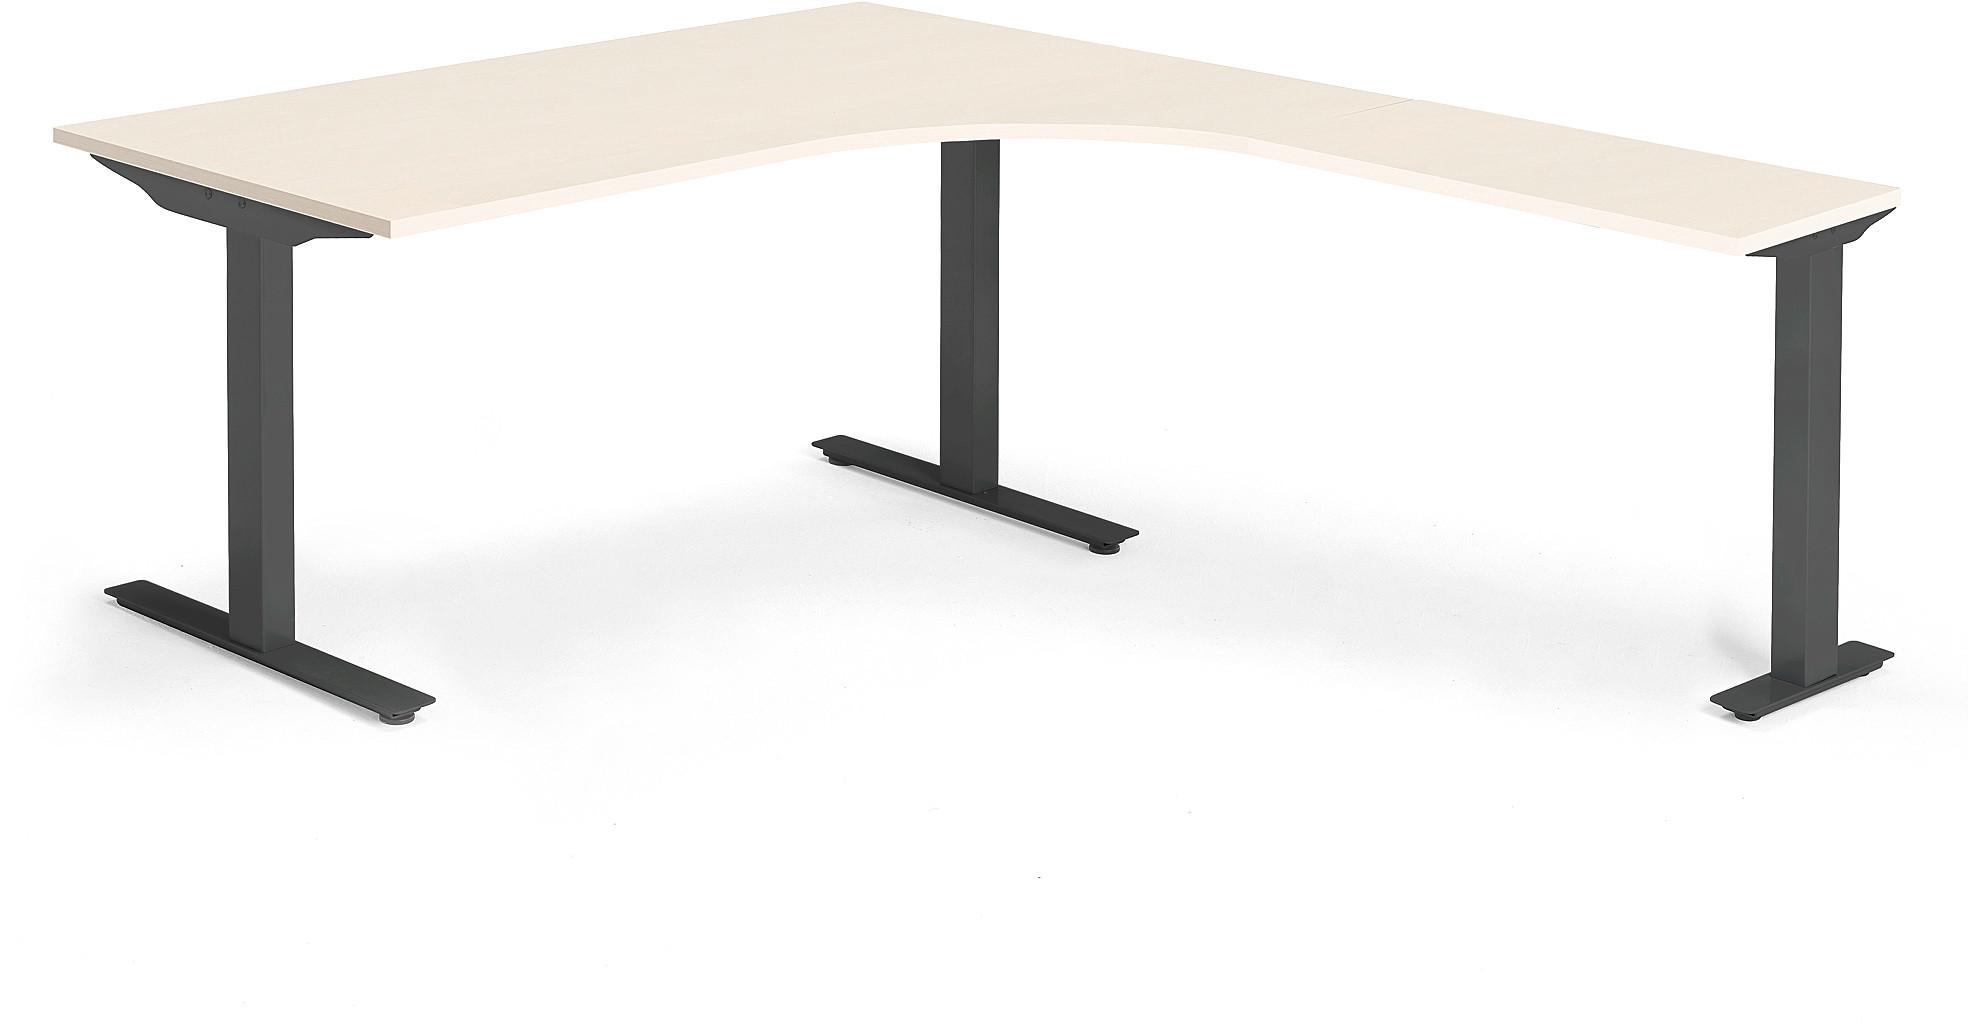 AJ Ergonomiczne biurko Modulus 1600x2000 mm czarna rama T blat brzoza 1612212